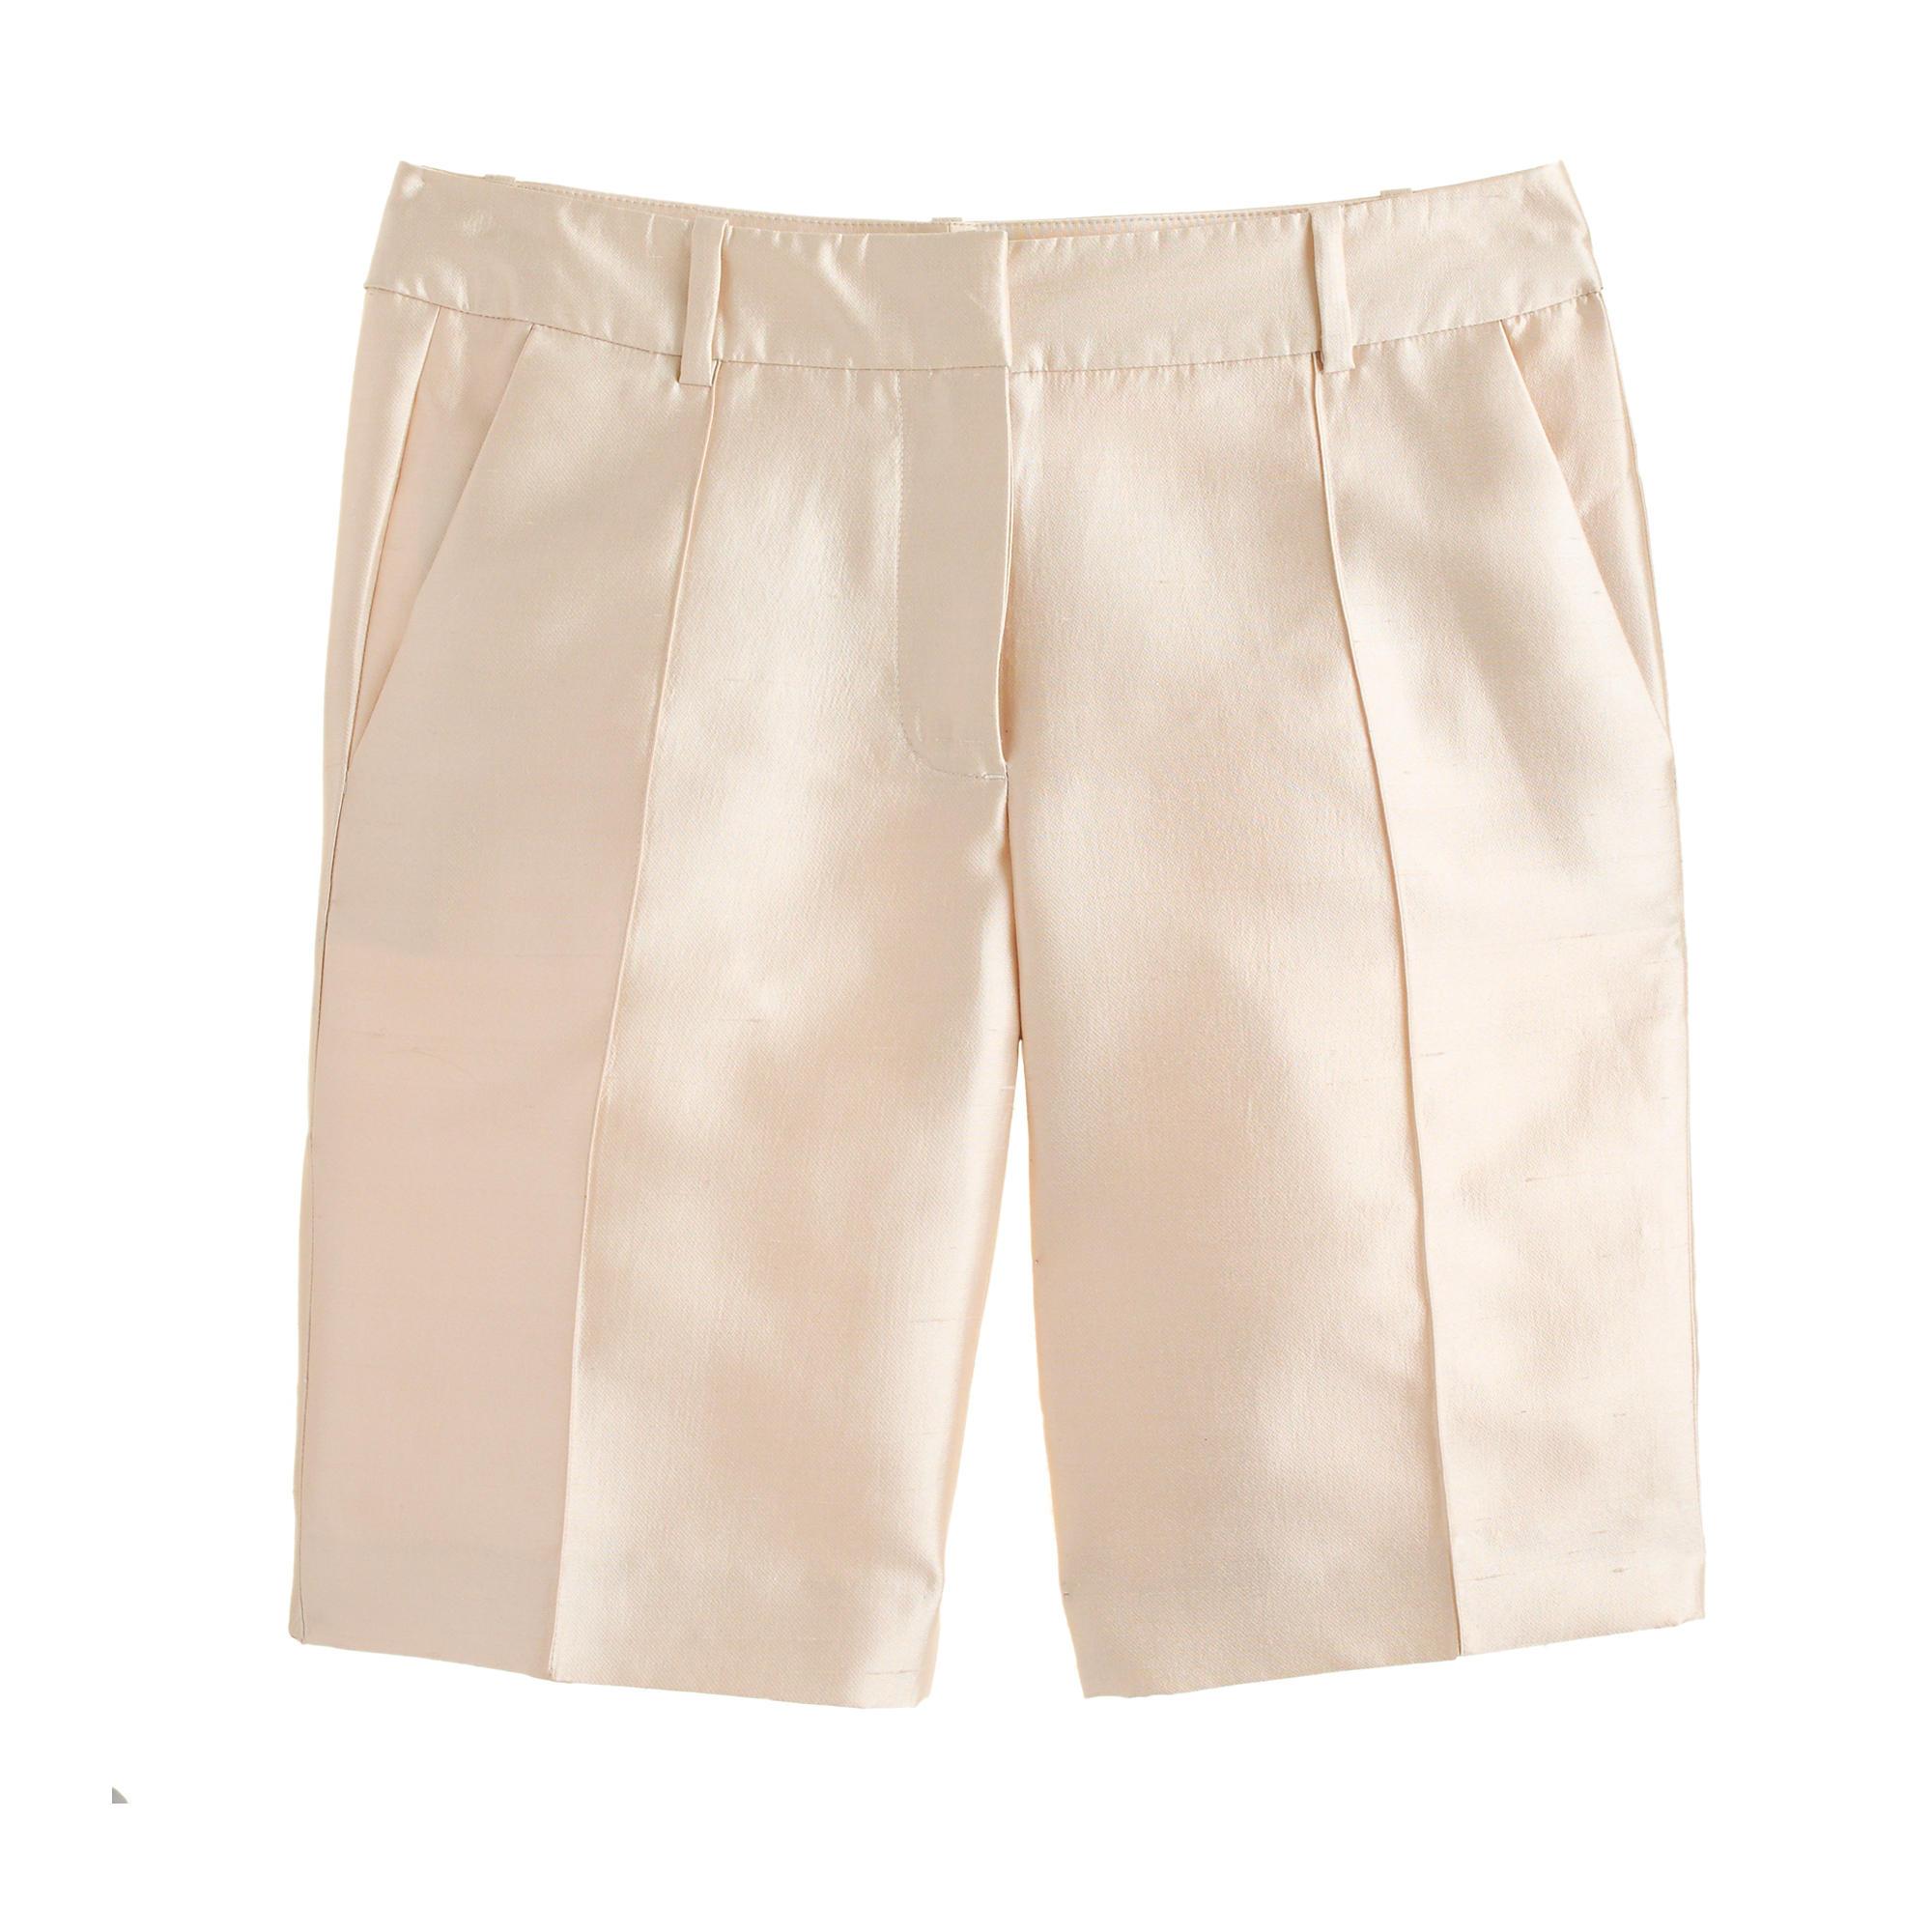 J.crew Collection Silk Shantung Bermuda Short in White